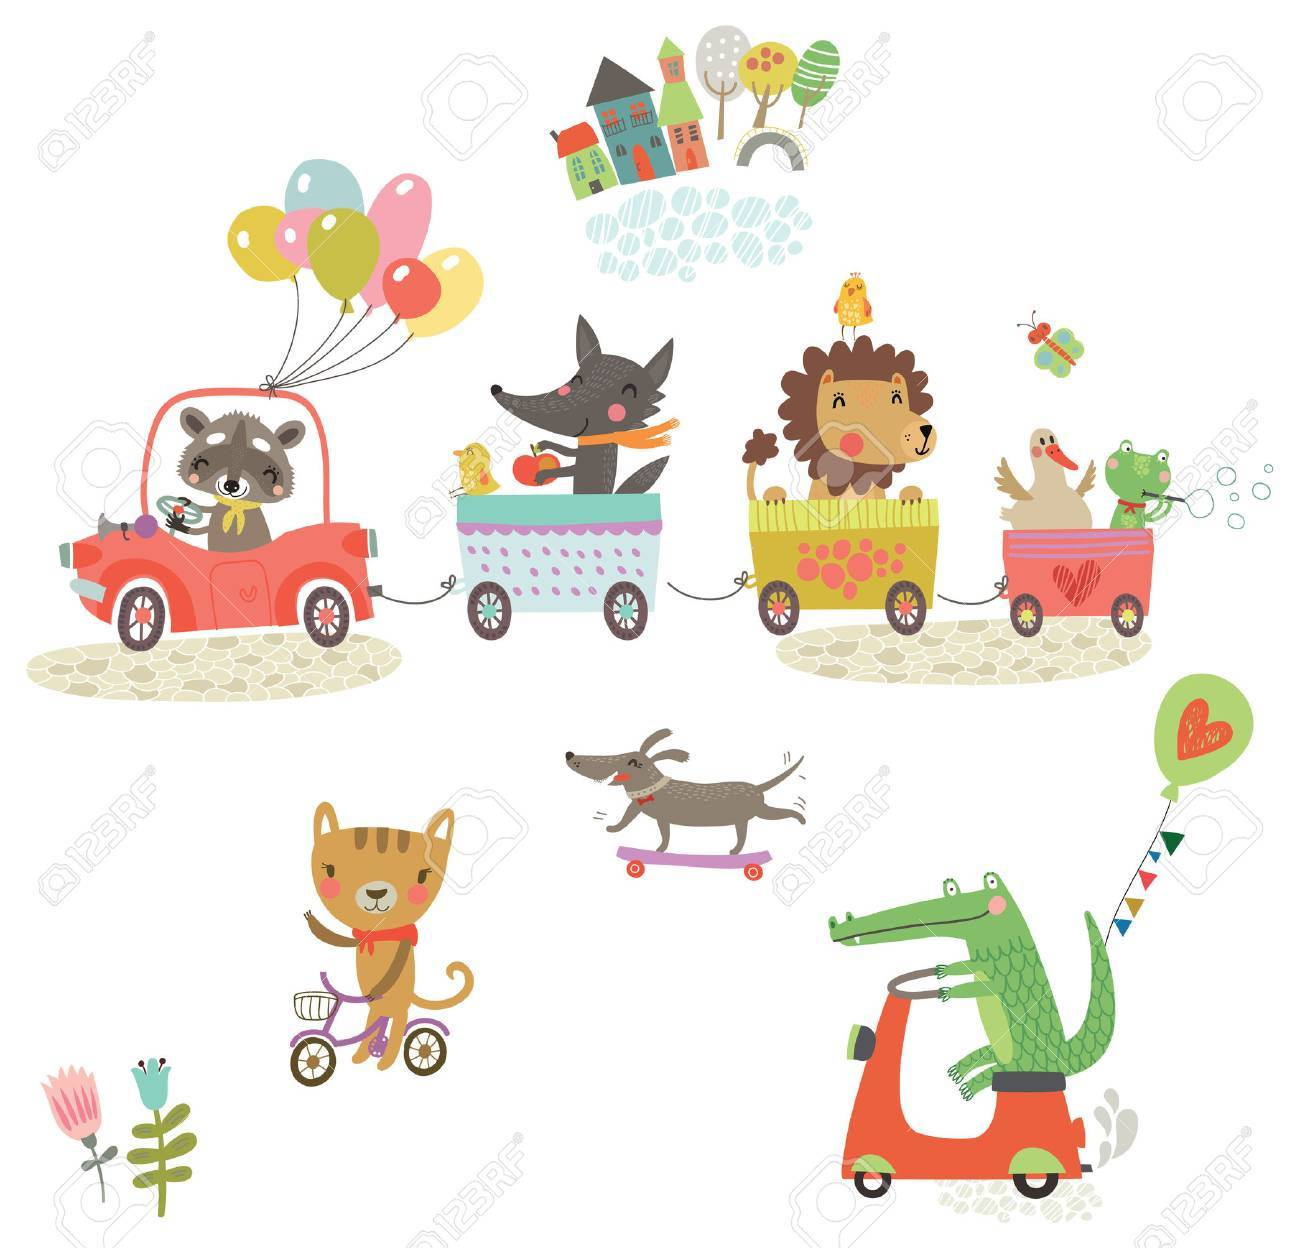 cute animals - 75067460